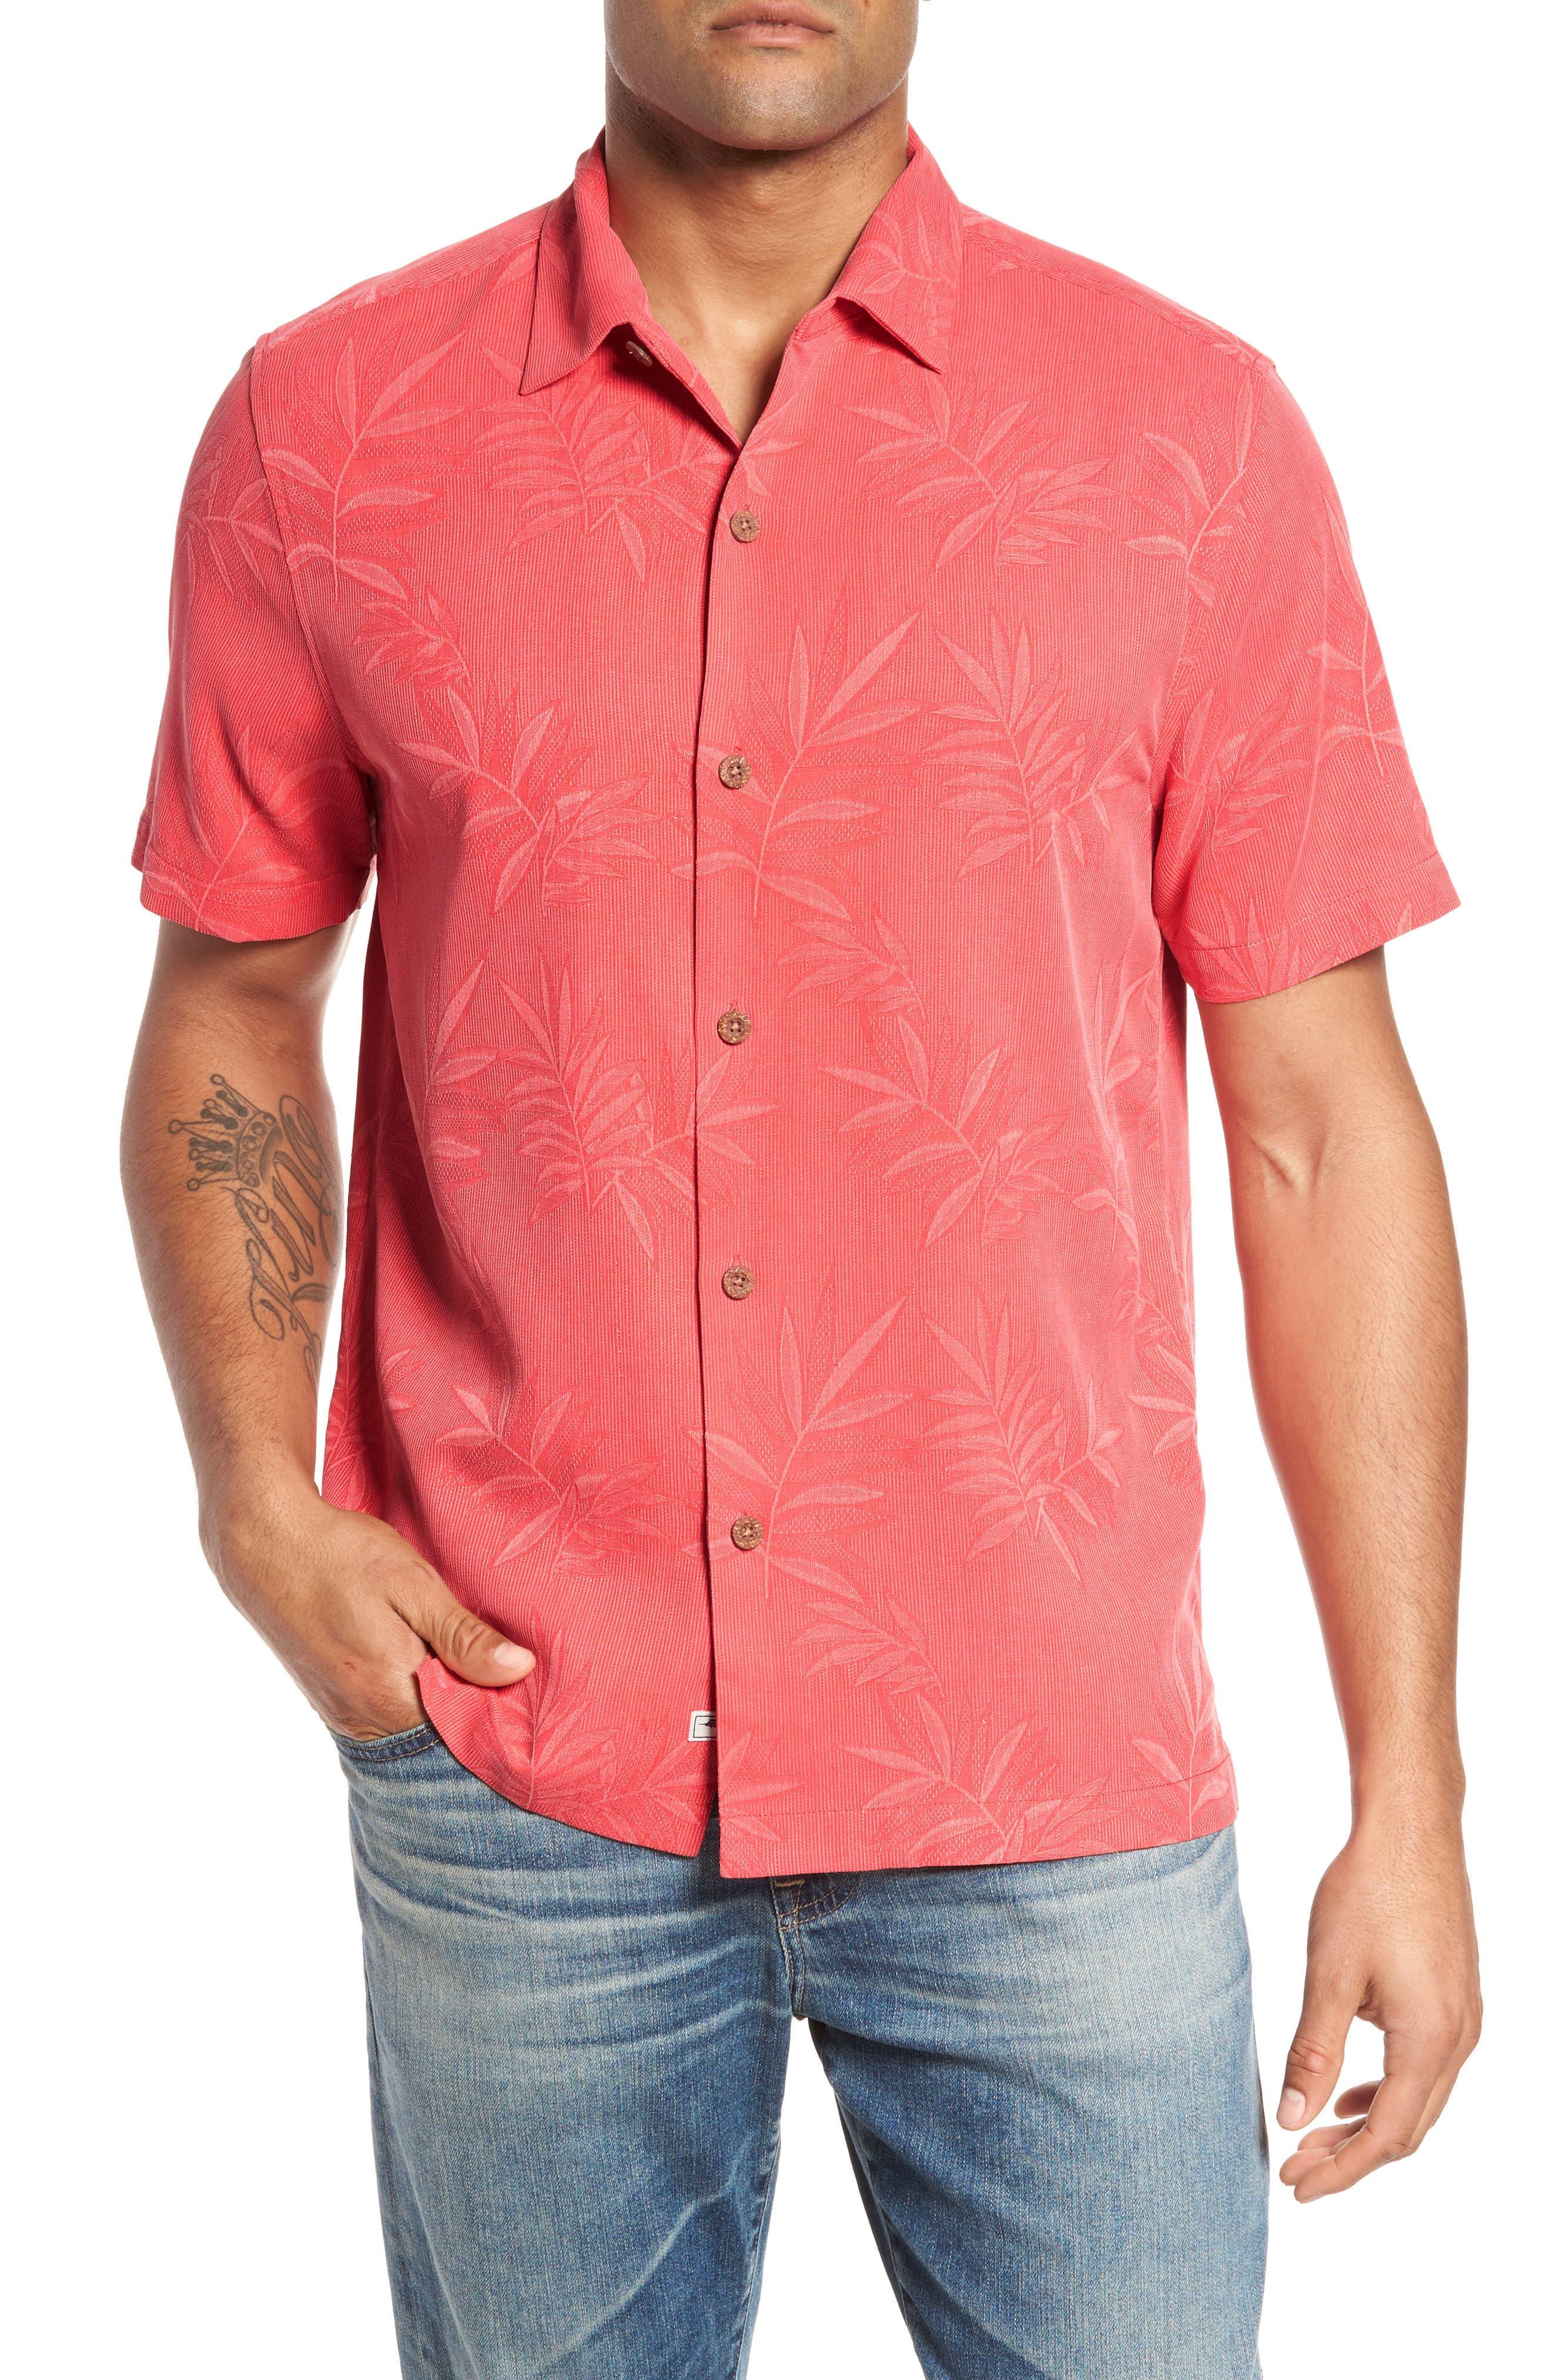 Tommy Bahama Beachwears LUAU FLORAL SILK SHIRT